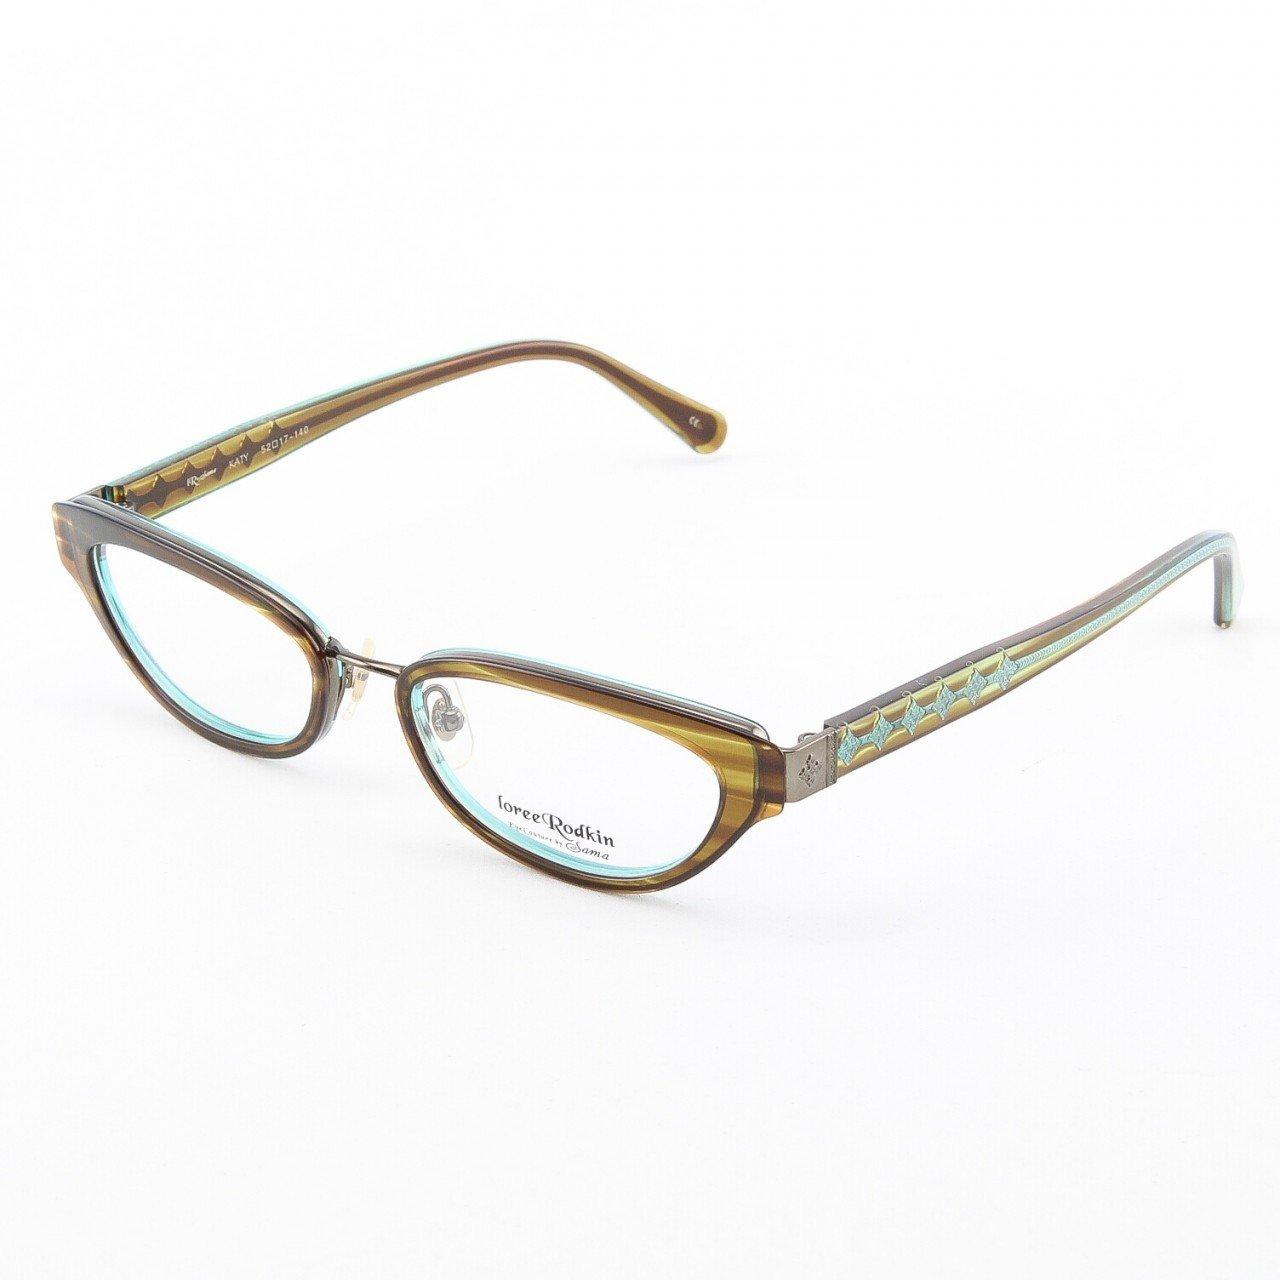 Eyeglass Frames Katy Texas : Loree Rodkin Katy Eyeglasses Olive w/ Clear Lenses ...